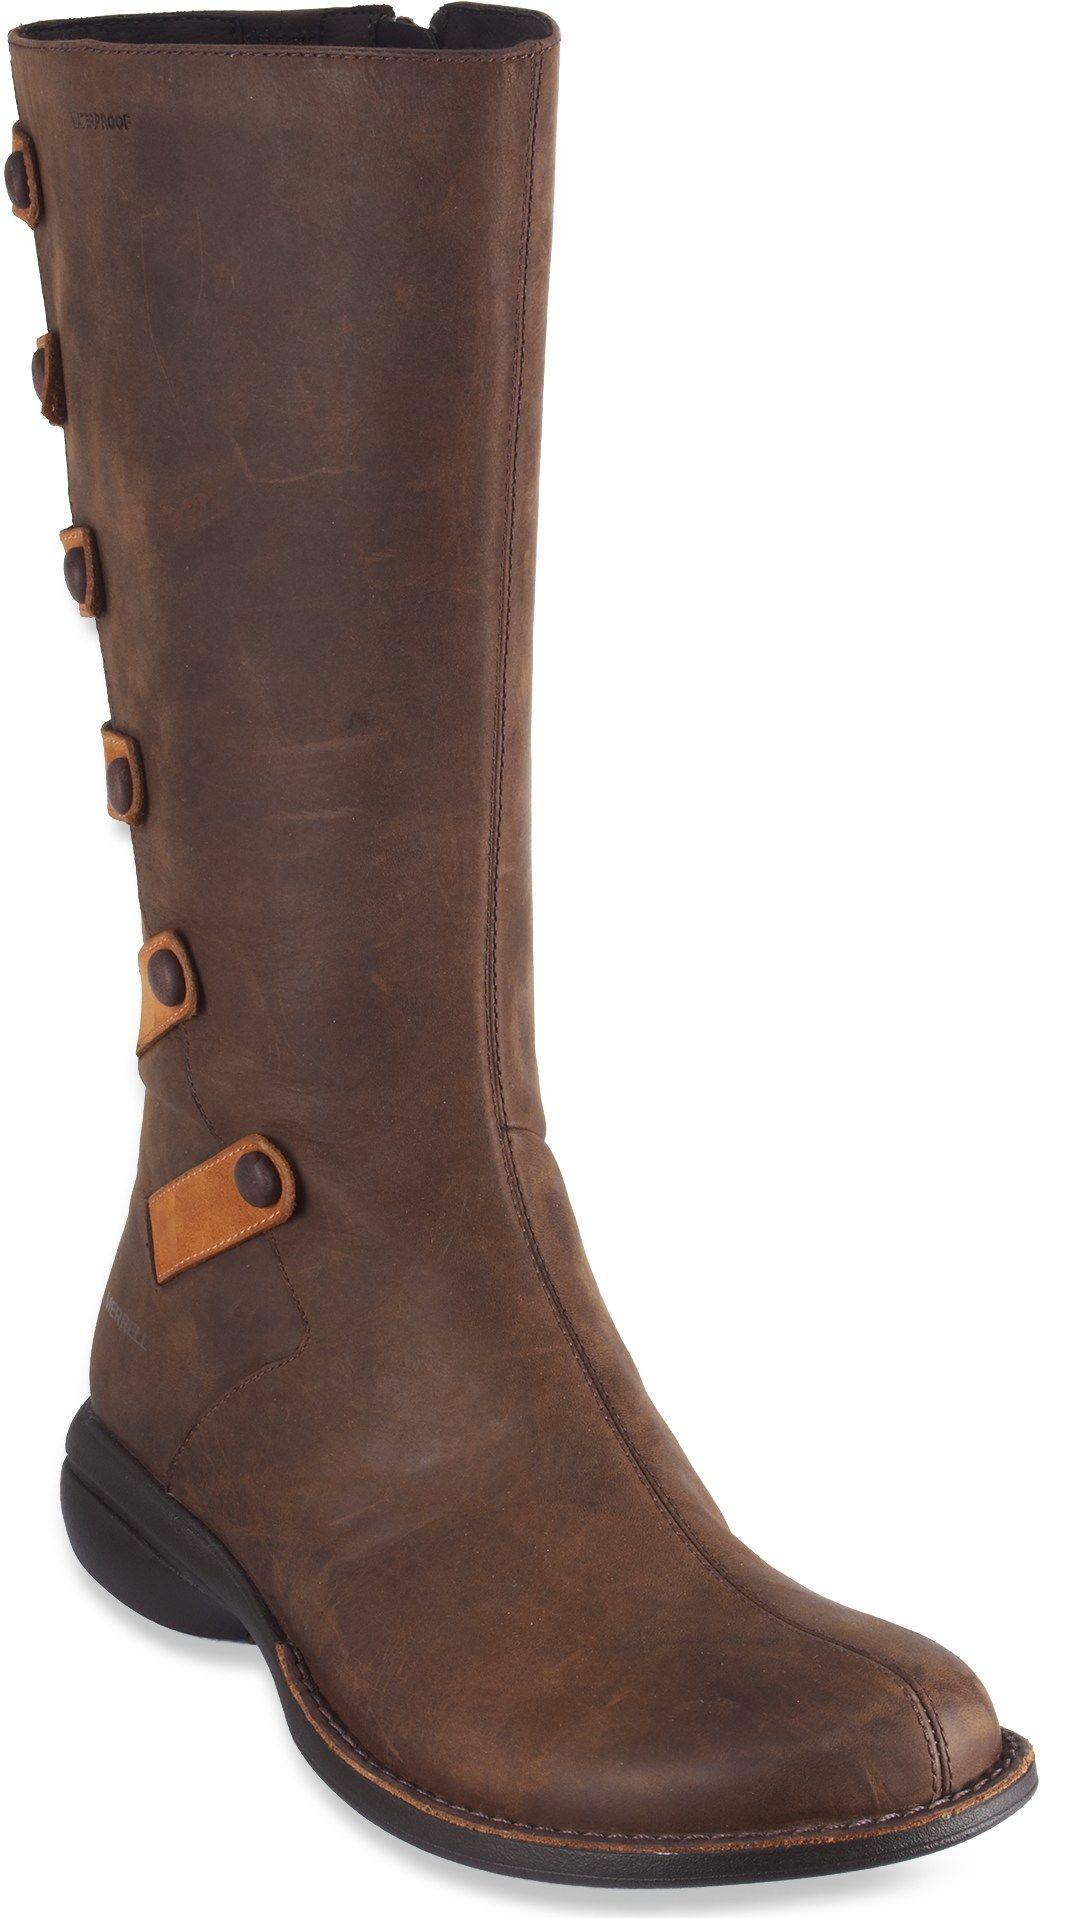 Merrell Captiva Launch Waterproof Boots (REI)